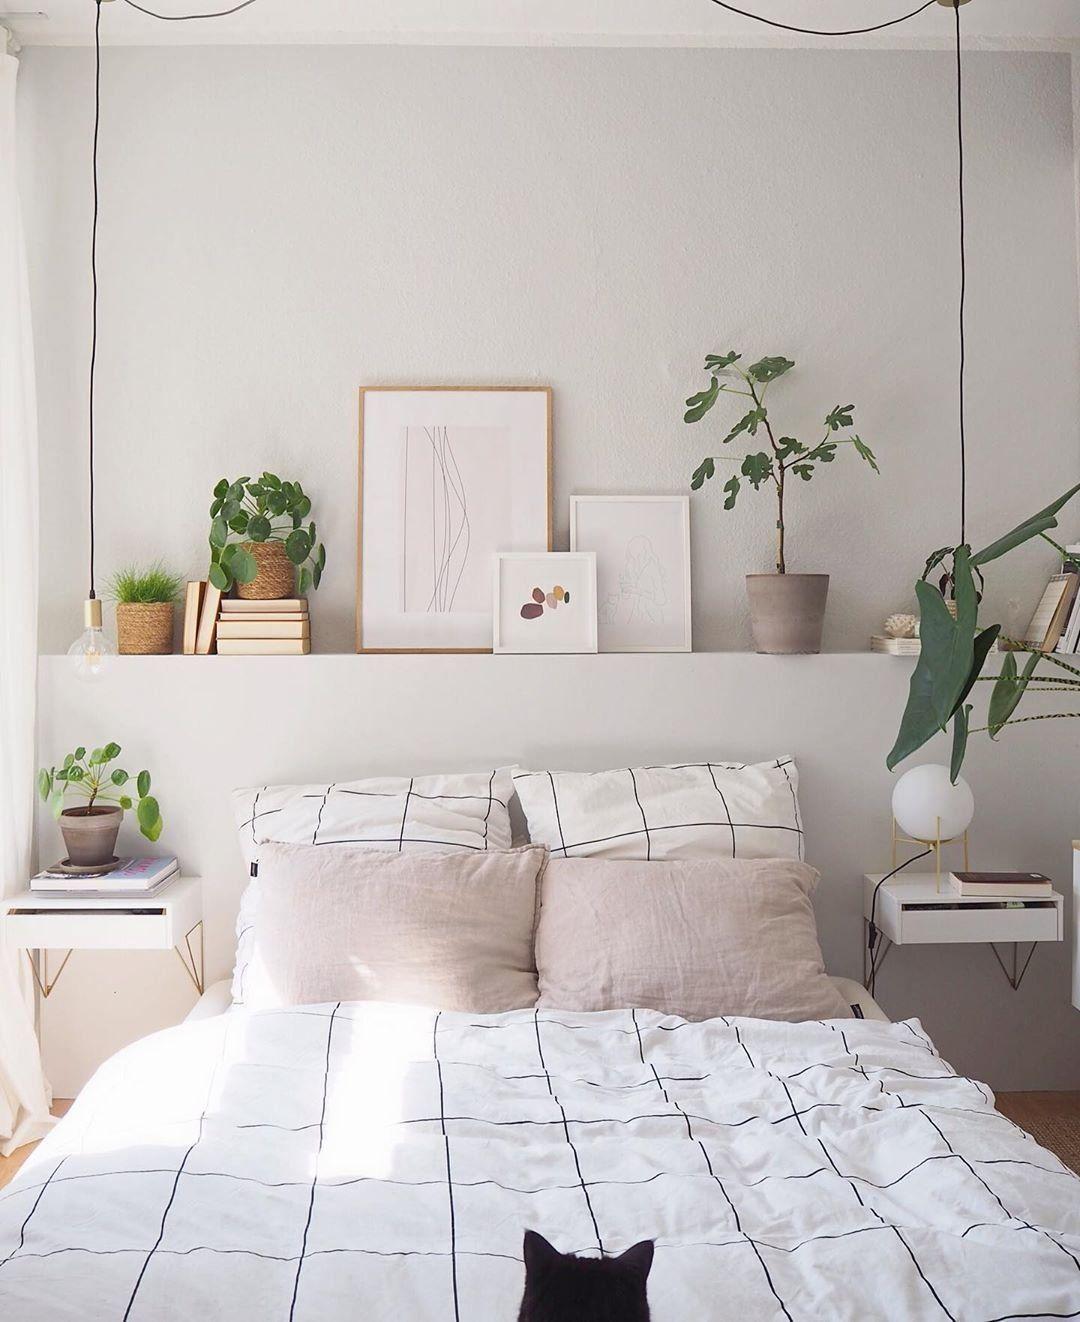 ideas for bedroom decor #bedroom decor ebay uk #bedroom decor